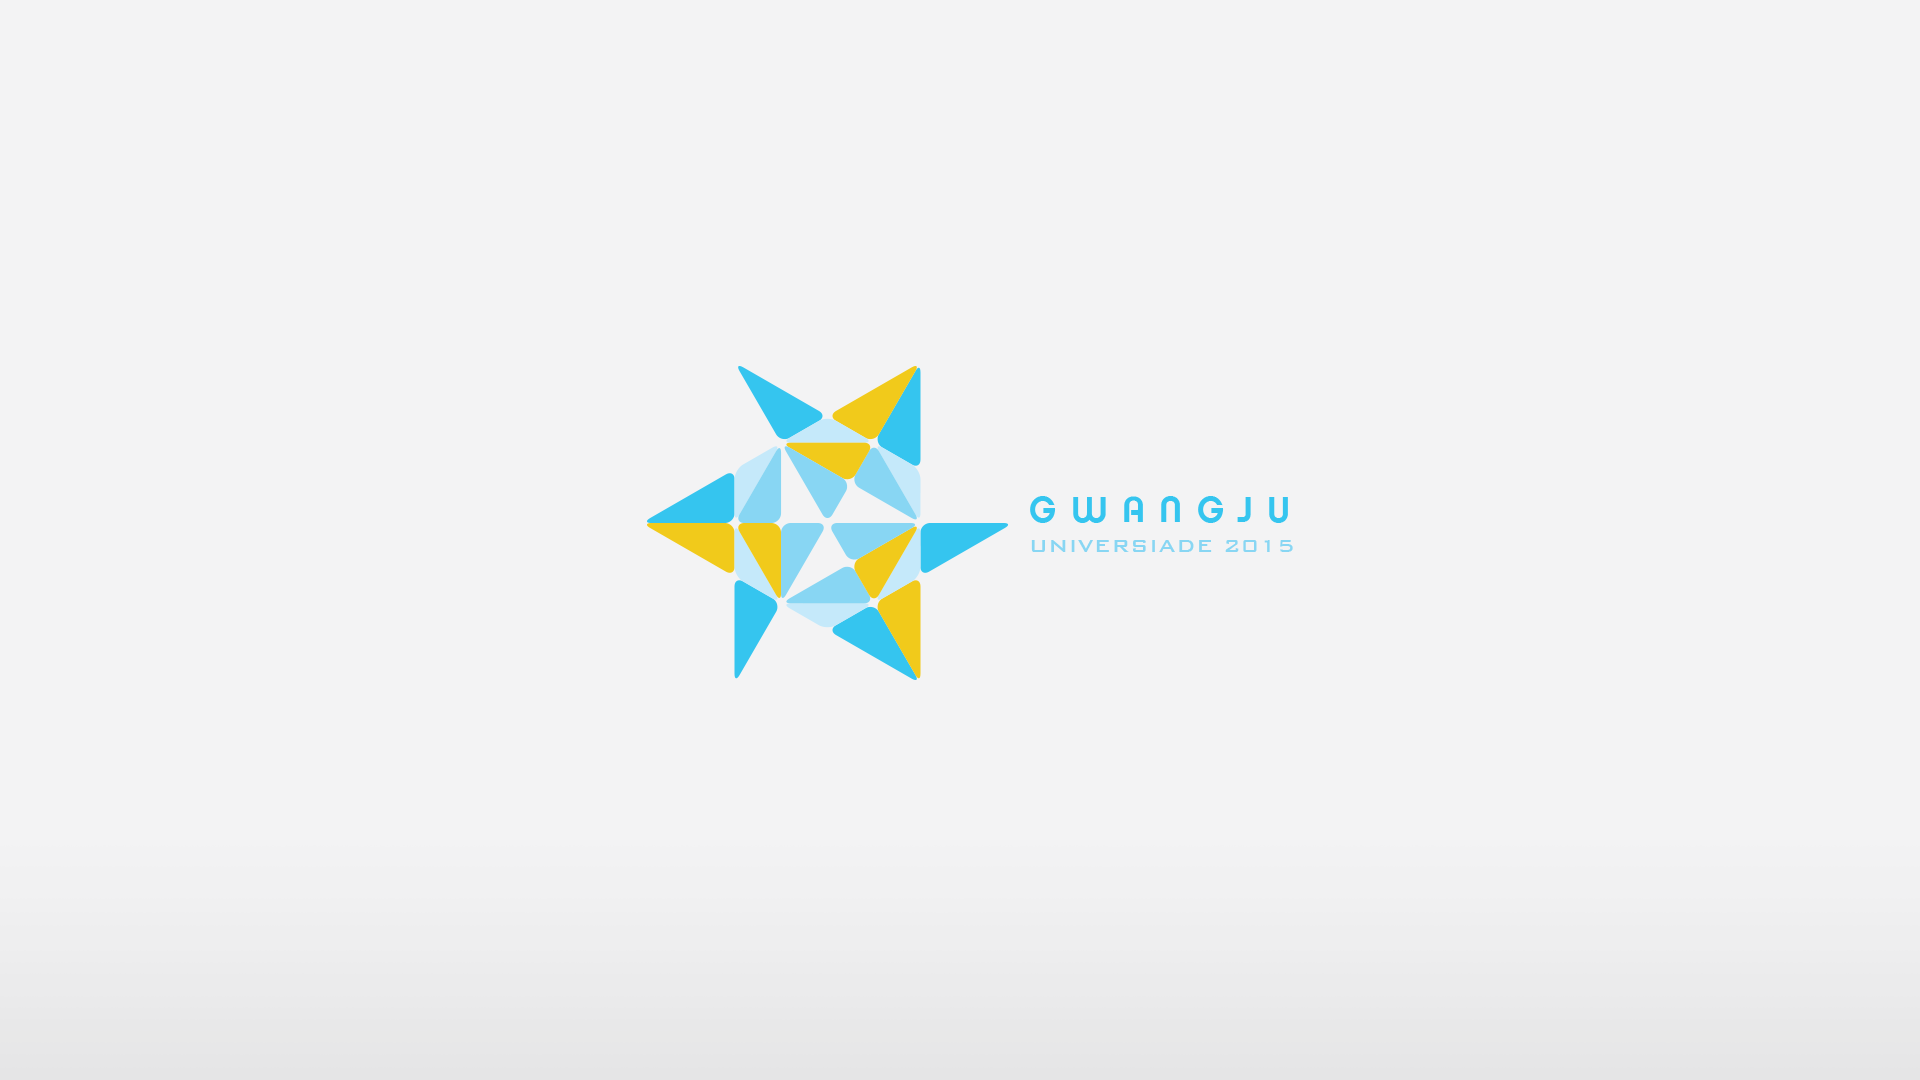 Logos_gwanju.png